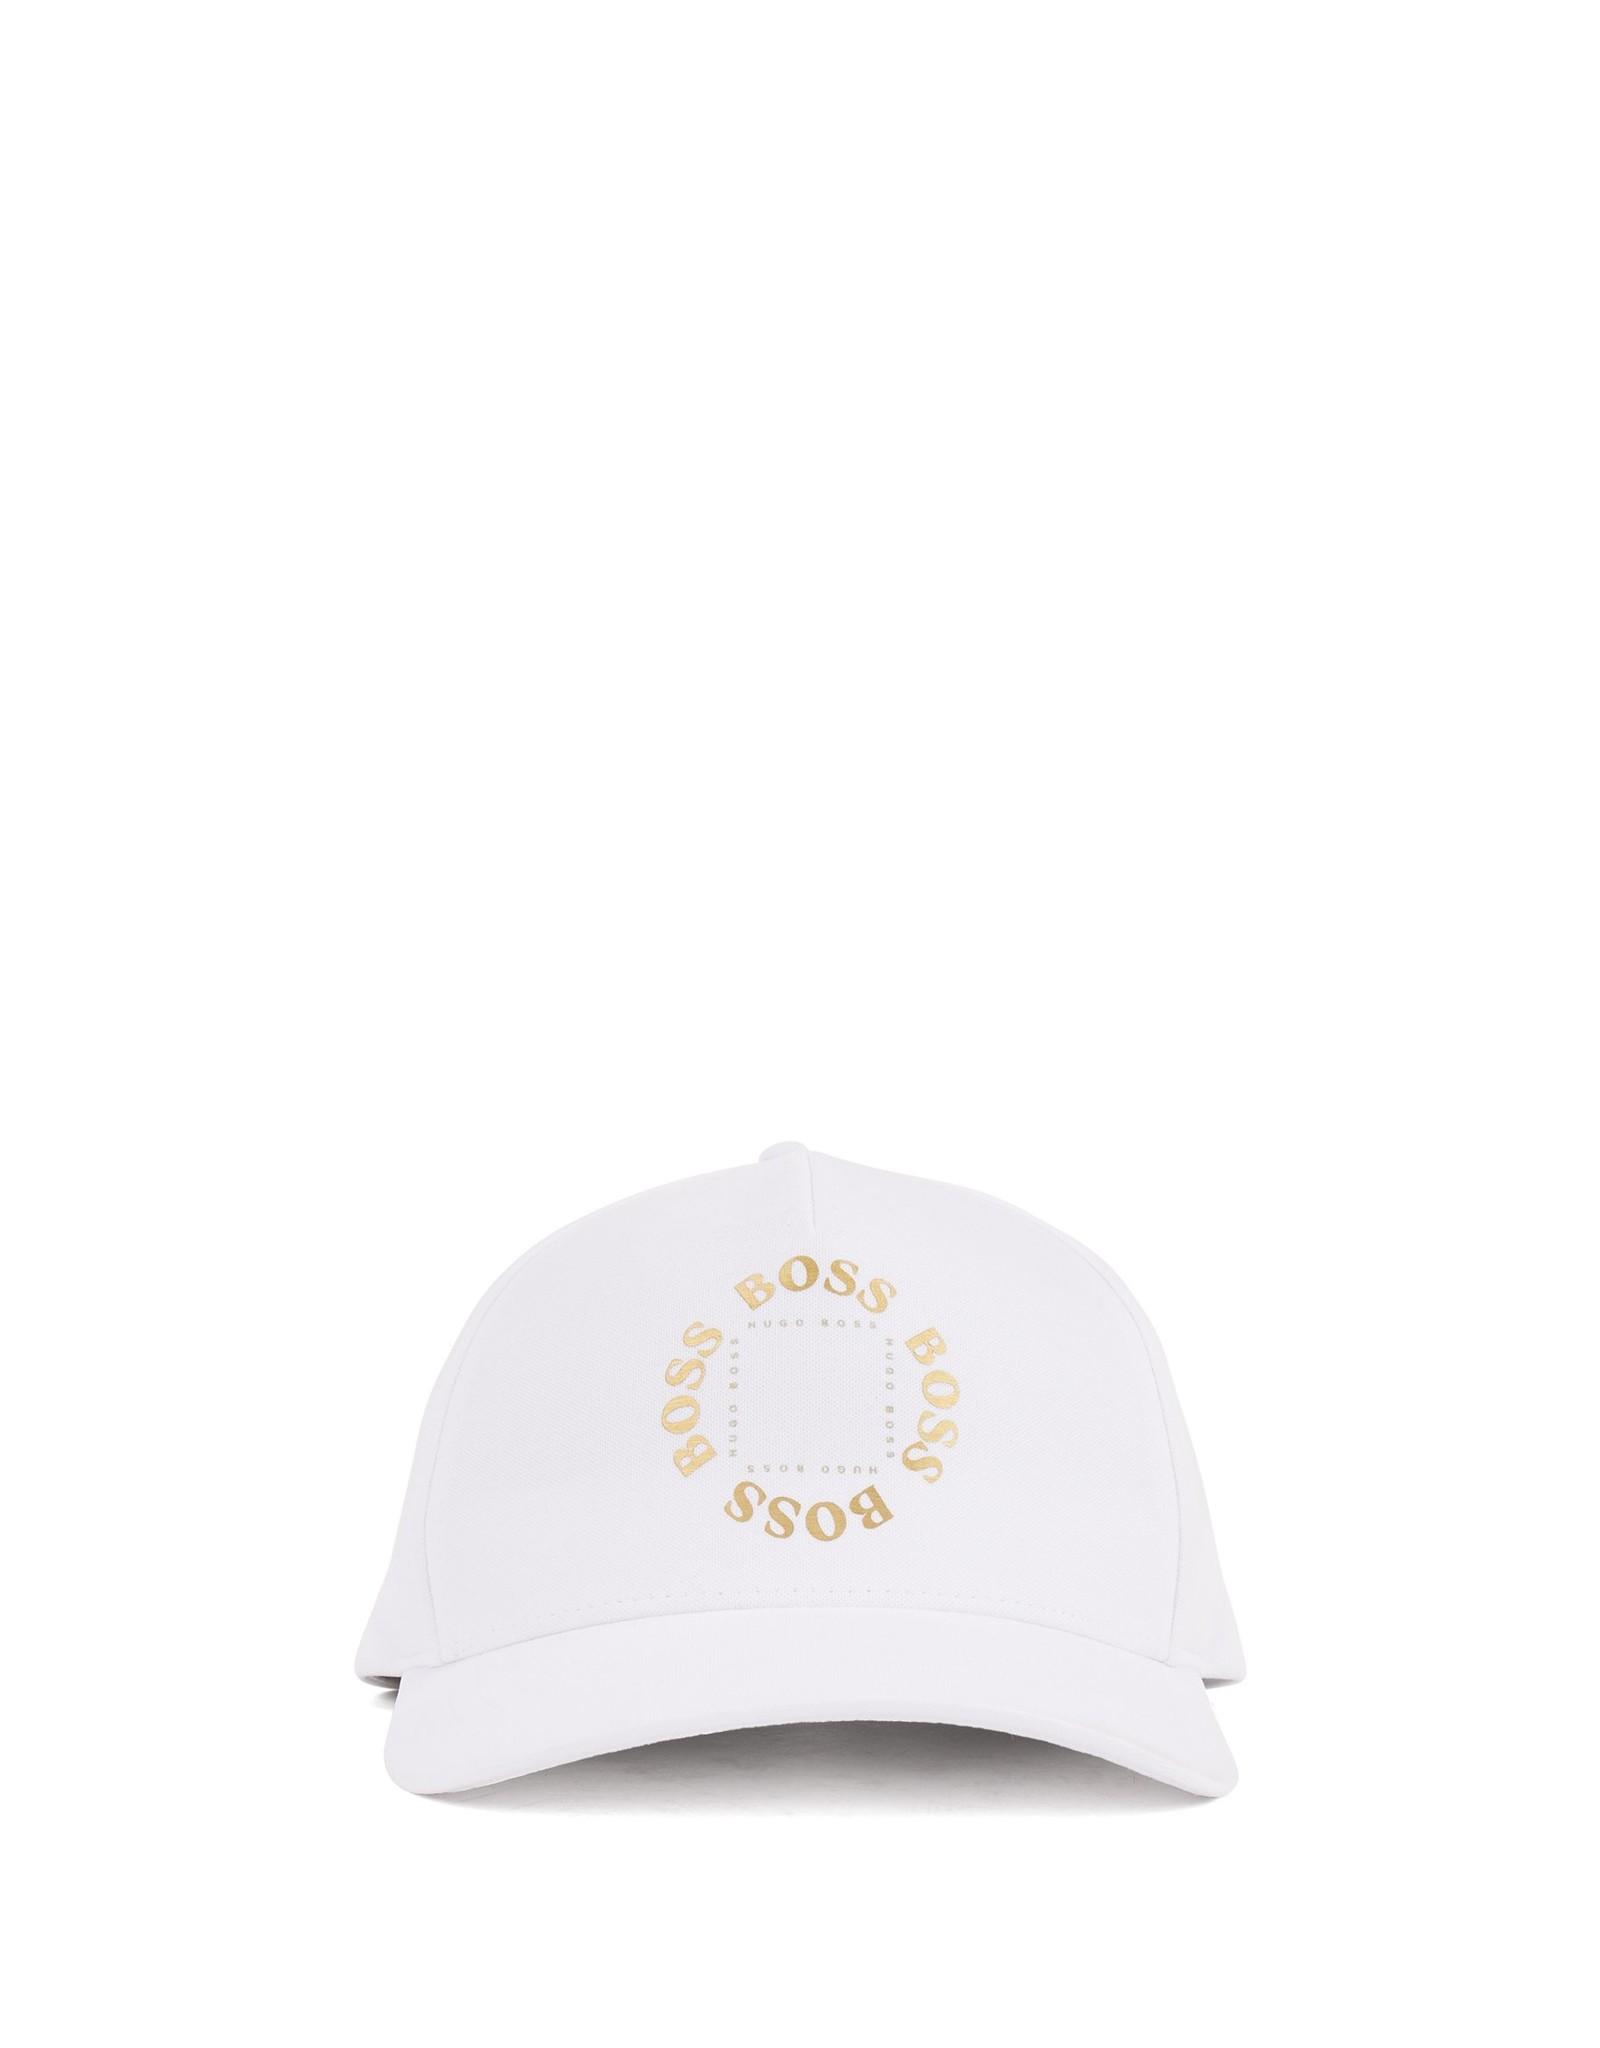 BOSS ATHLEISURE BOSS ATHLEISURE CAP CIRCLE SS20